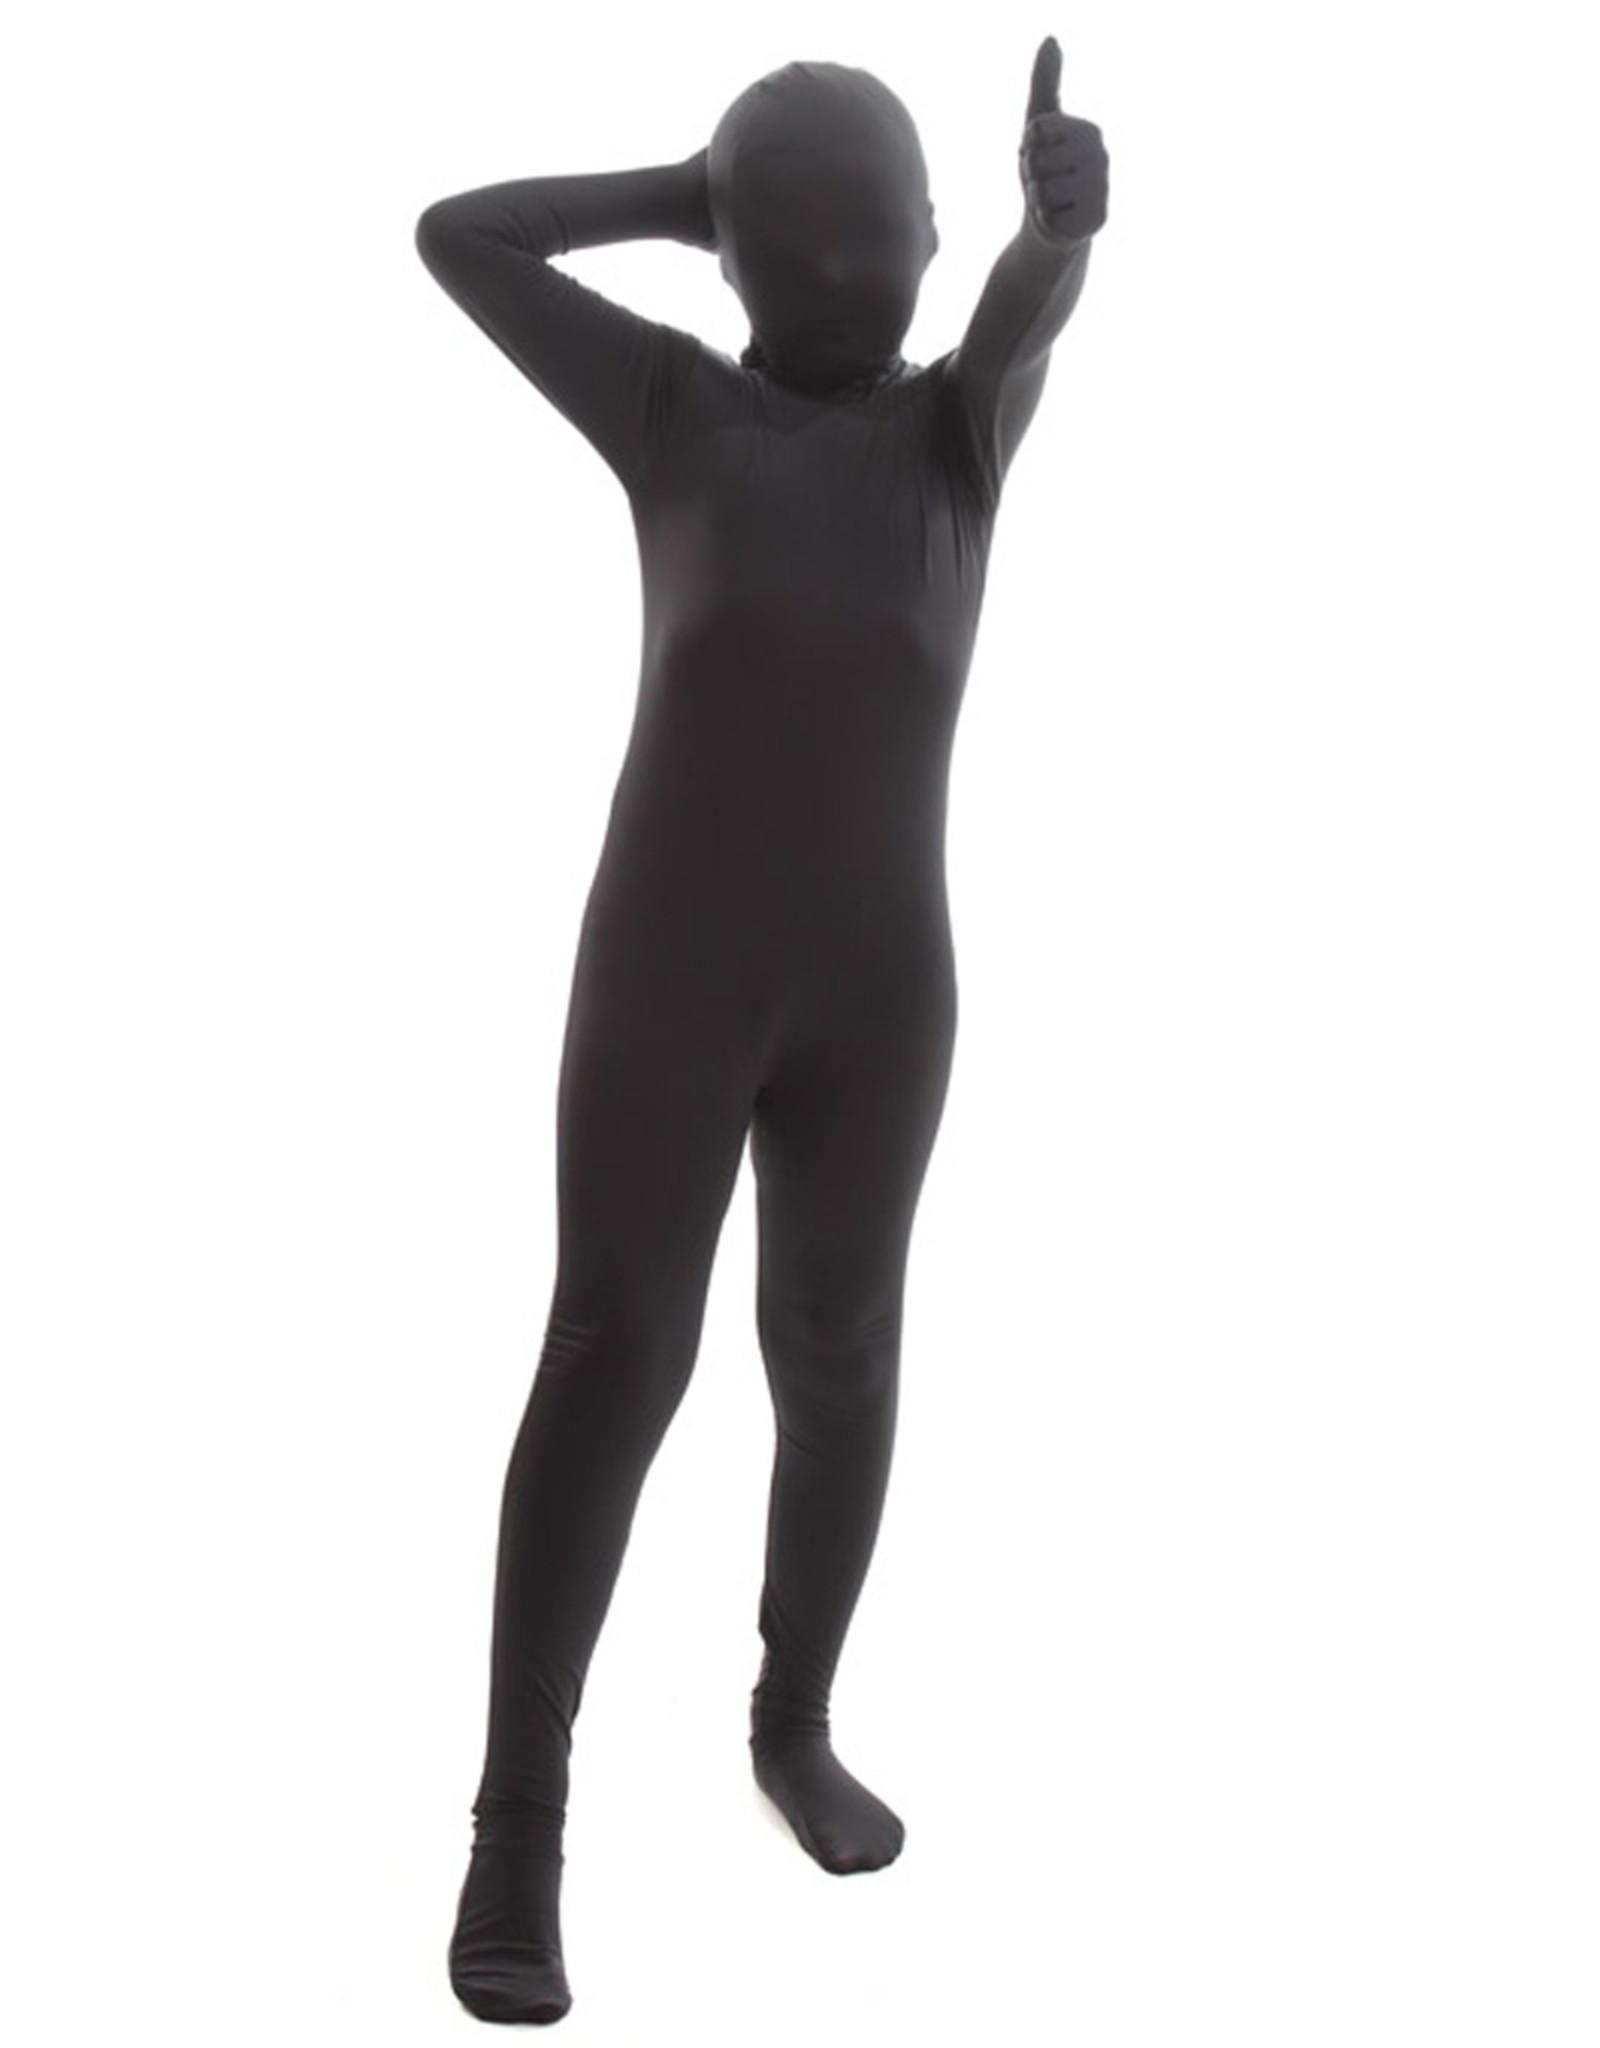 Black Morphsuit Costume - Boy's